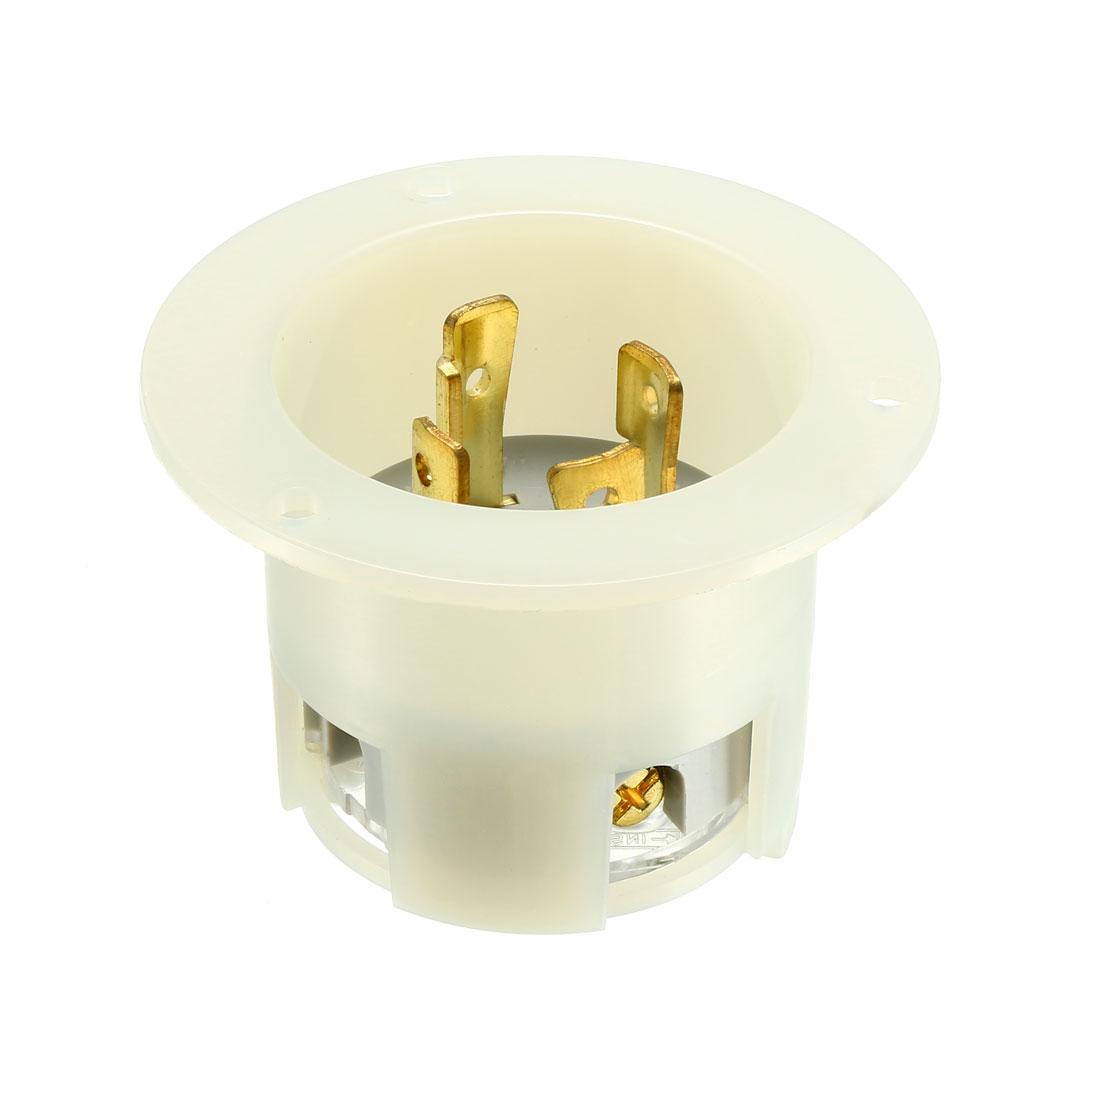 Flanged Power Inlet Twist Lock NEMA L15-30P, 30A 250VAC, 3 Pole 4 Wire